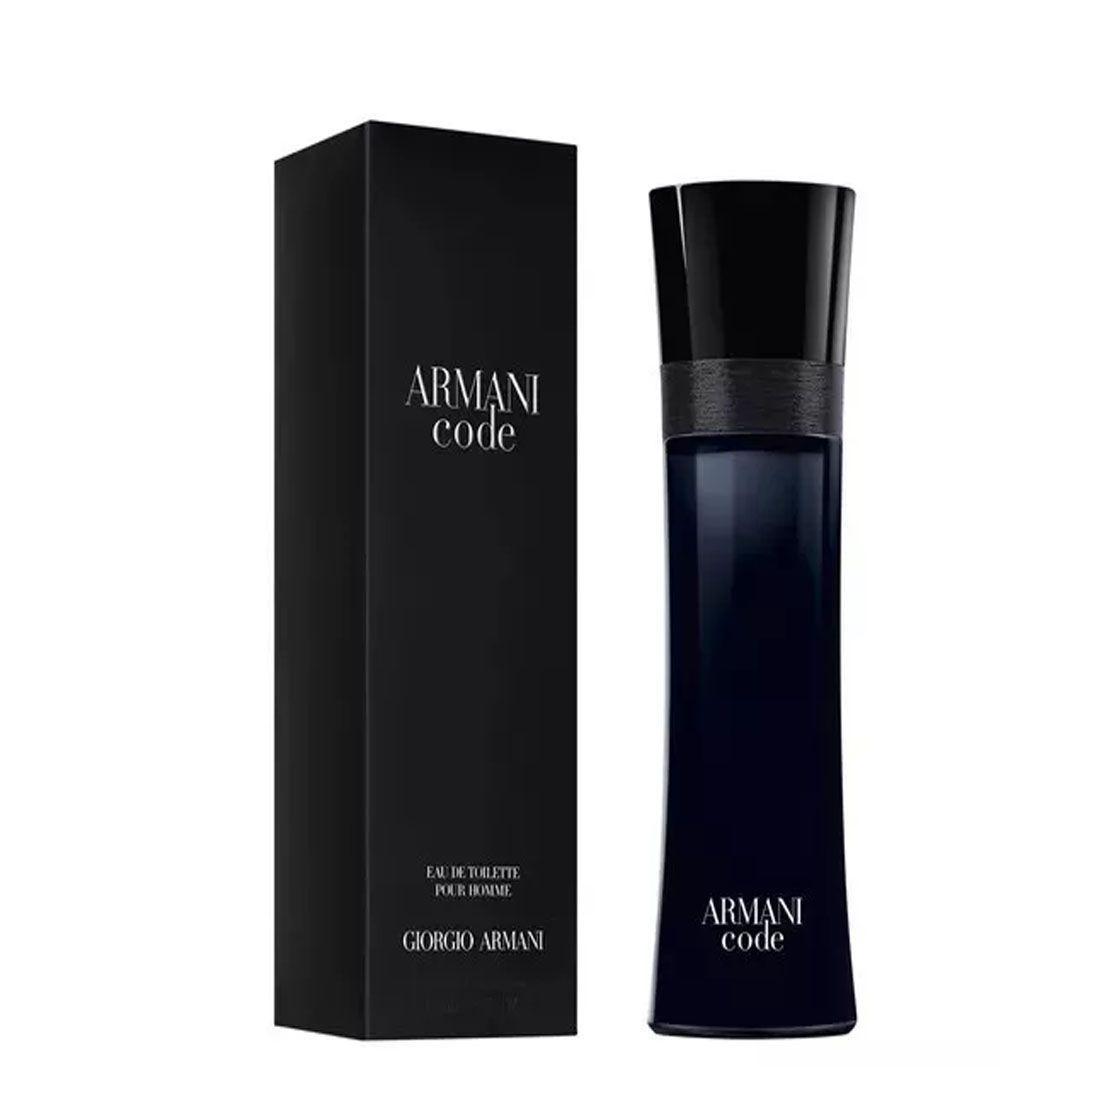 Perfume Armani Code Giorgio Armani Eau De Toilette 75ml